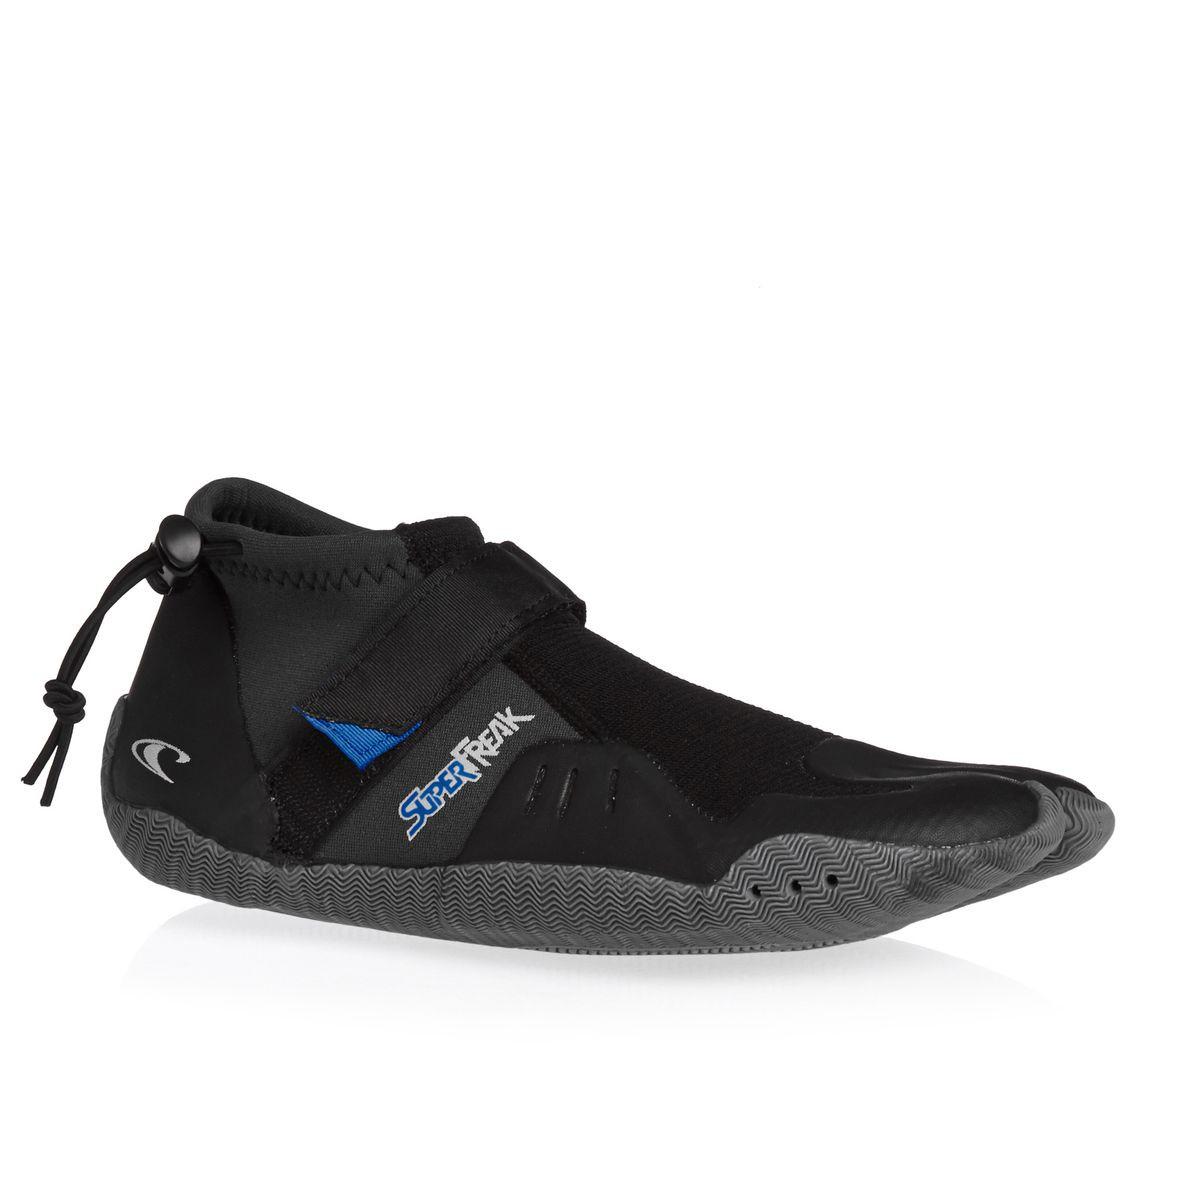 O'Neill Superfreak Tropical Split Toe Boot - Black